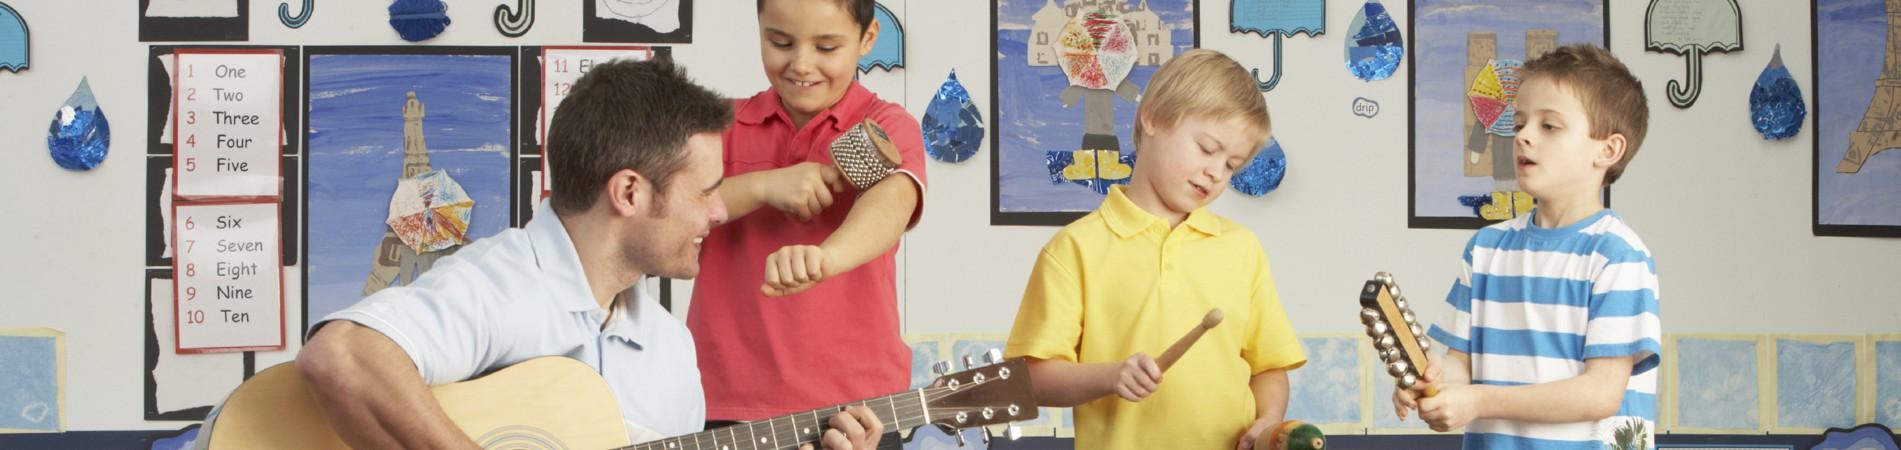 Organic and instinctive language learning. At school, at home … y en cualquier lugar!